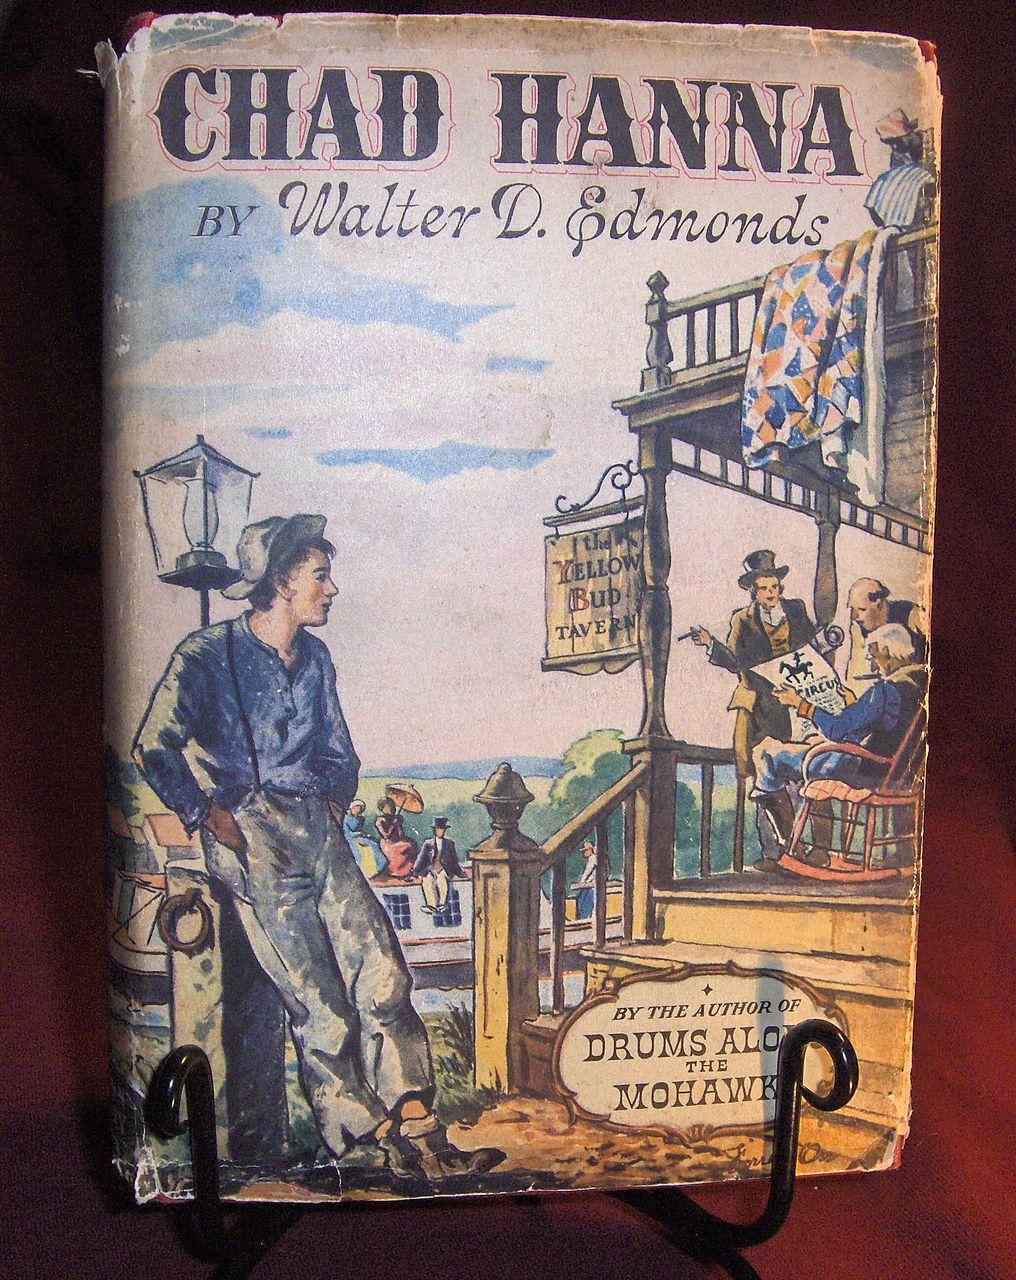 Book – Chad Hanna by Walter D.  Edmonds